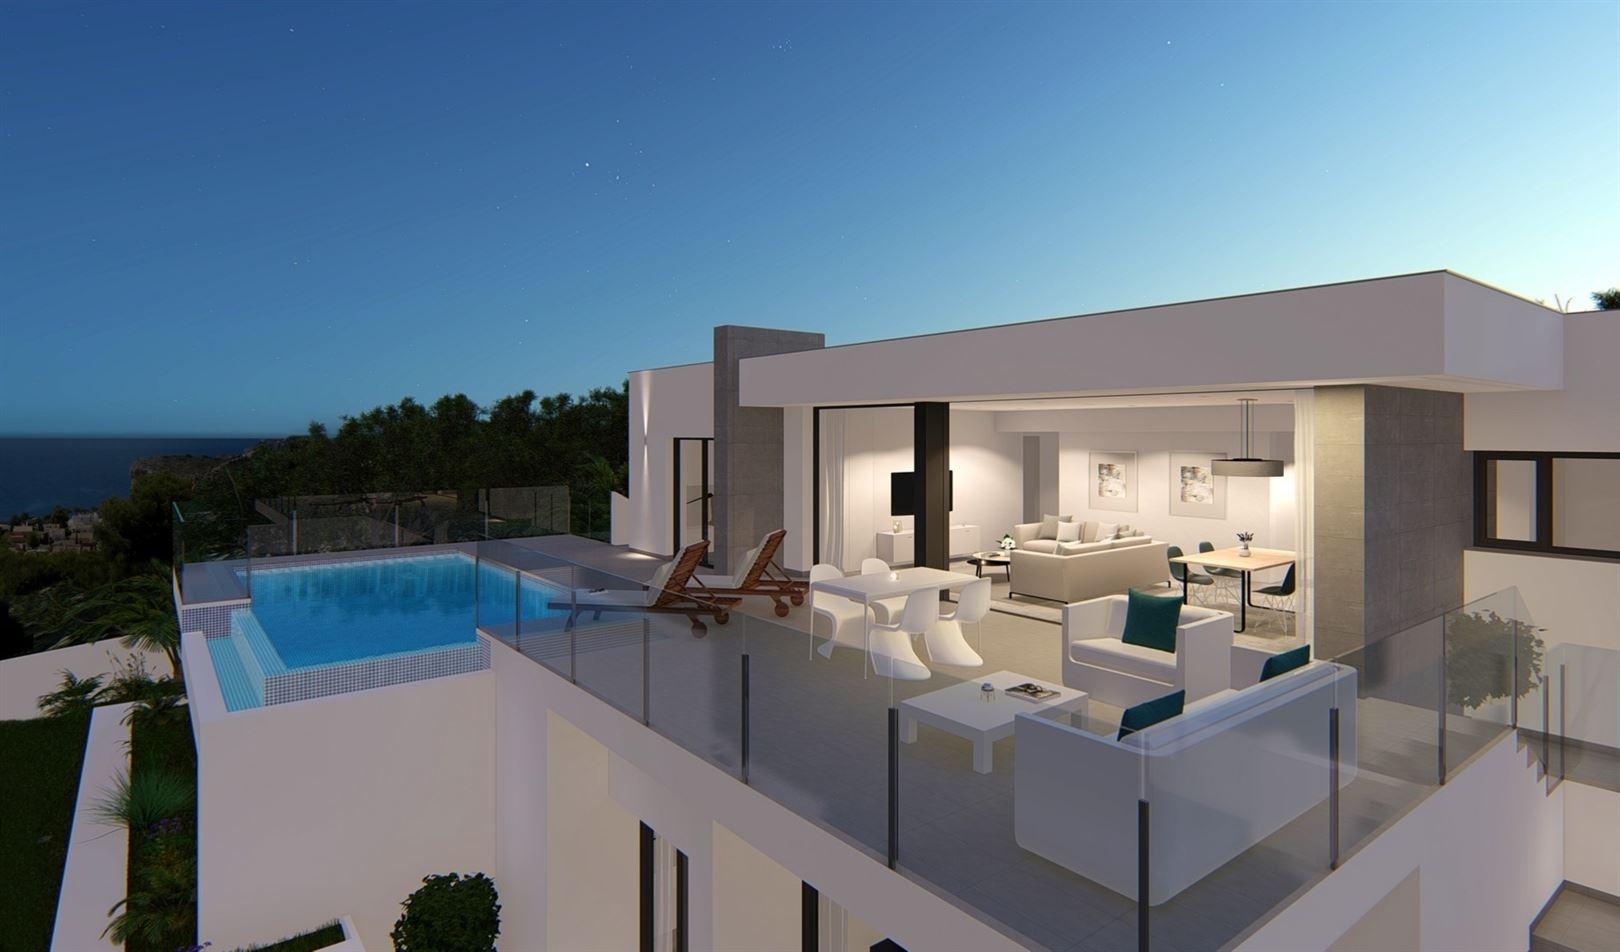 Foto 5 : Villa te   (Spanje) - Prijs € 735.000